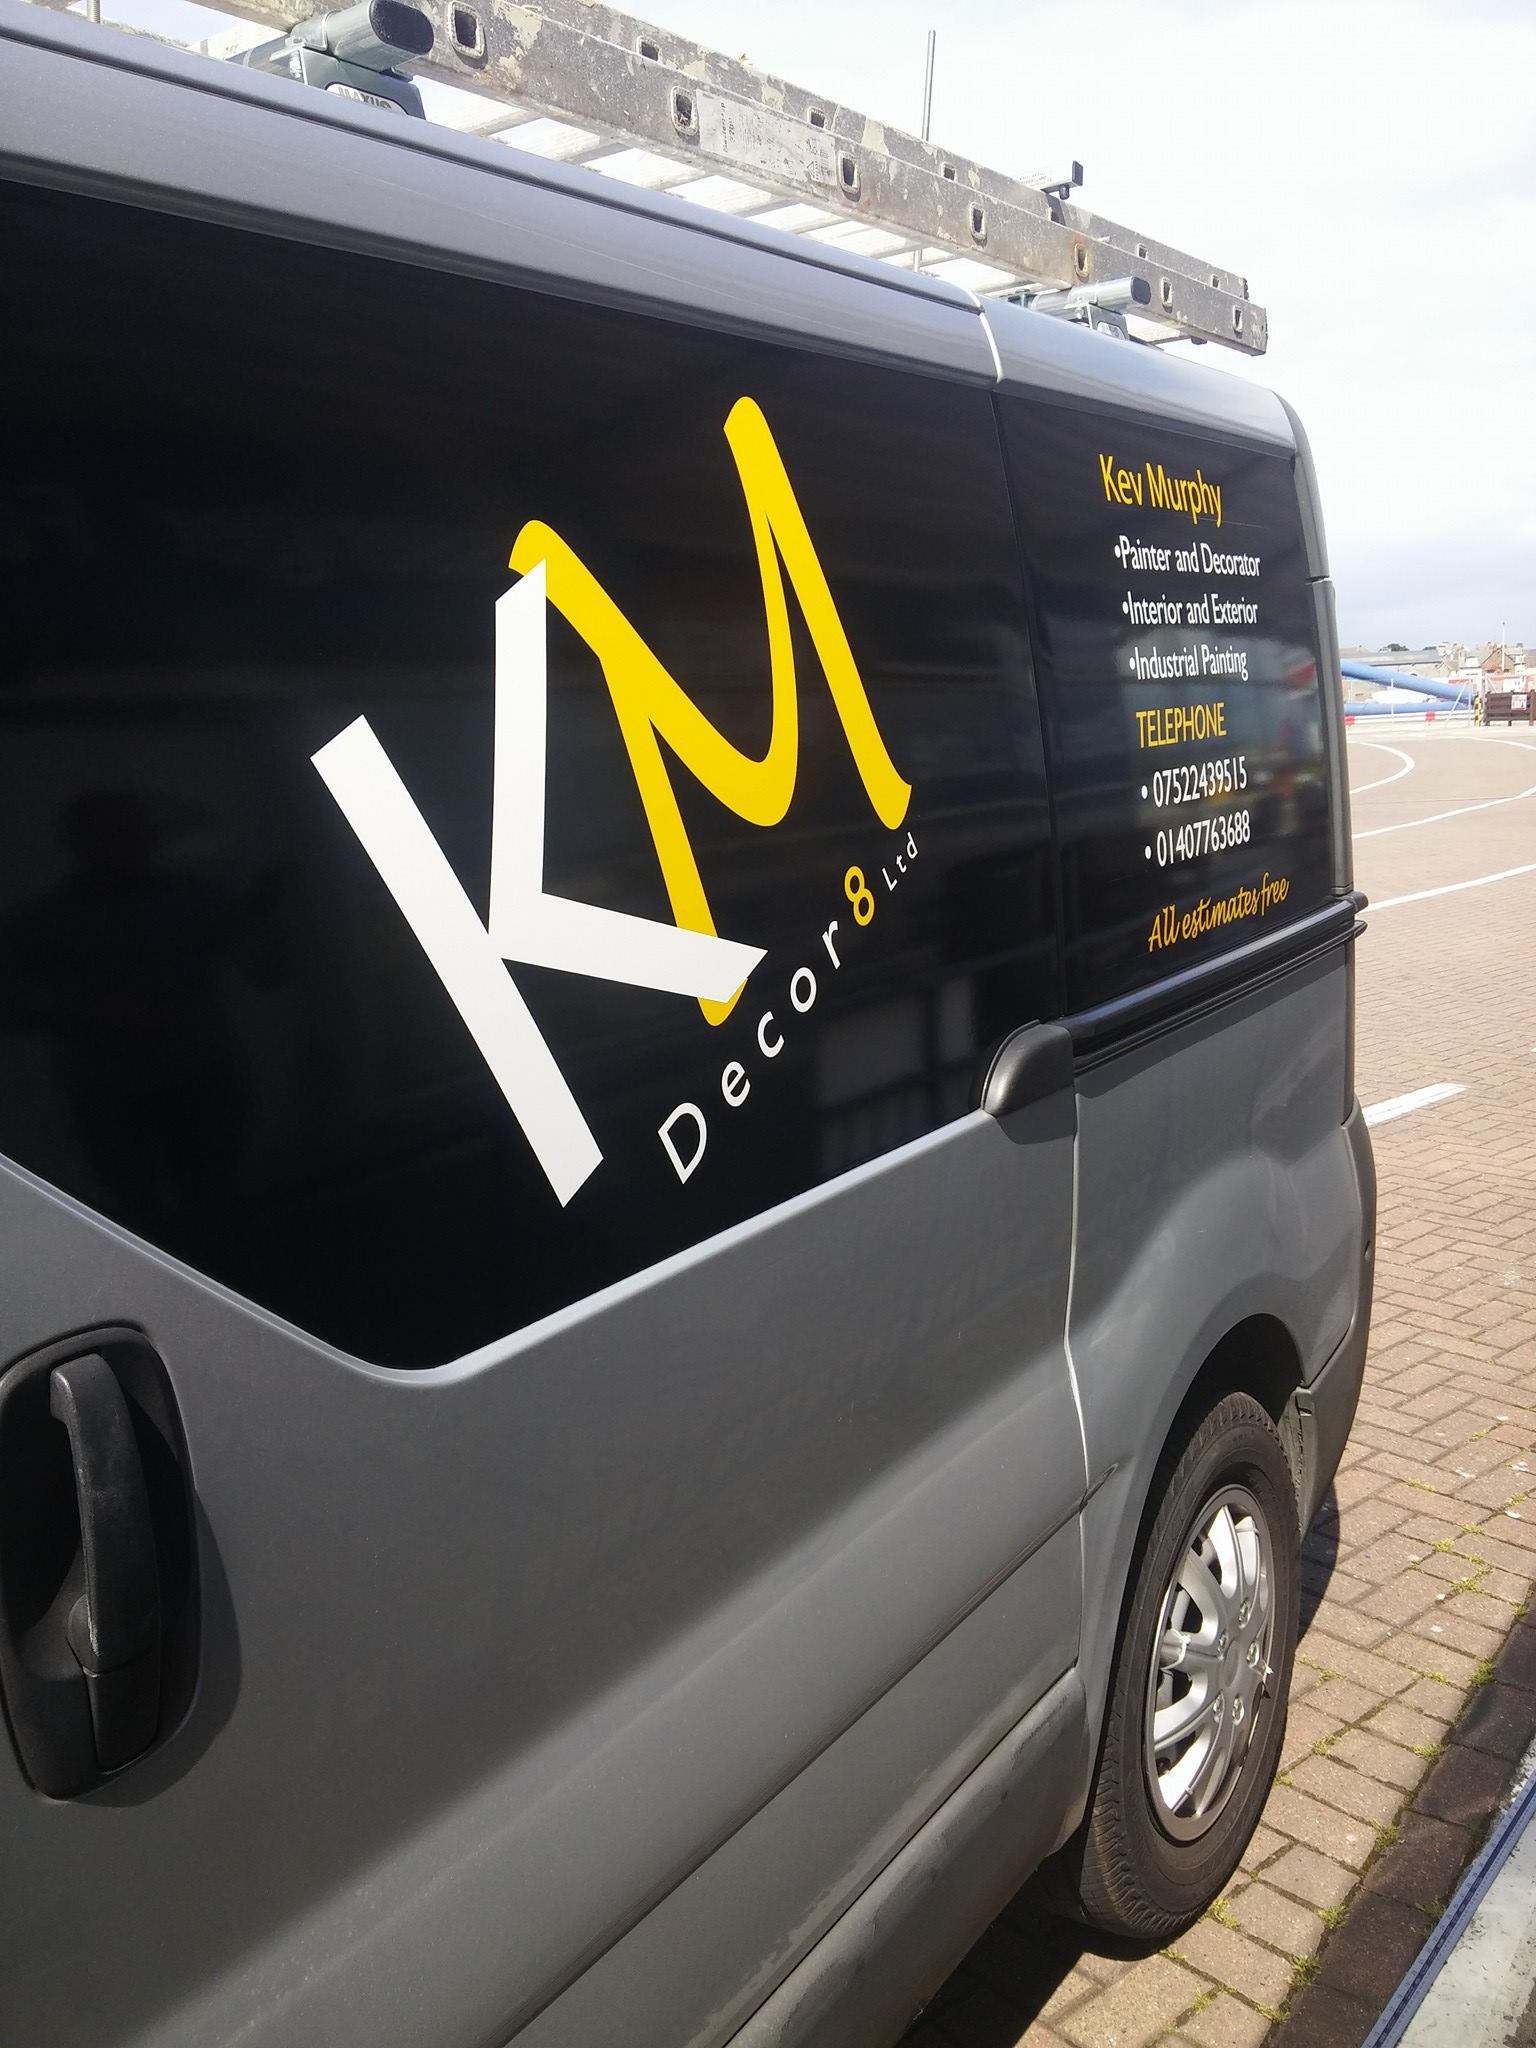 KM Decor8 Branding Project